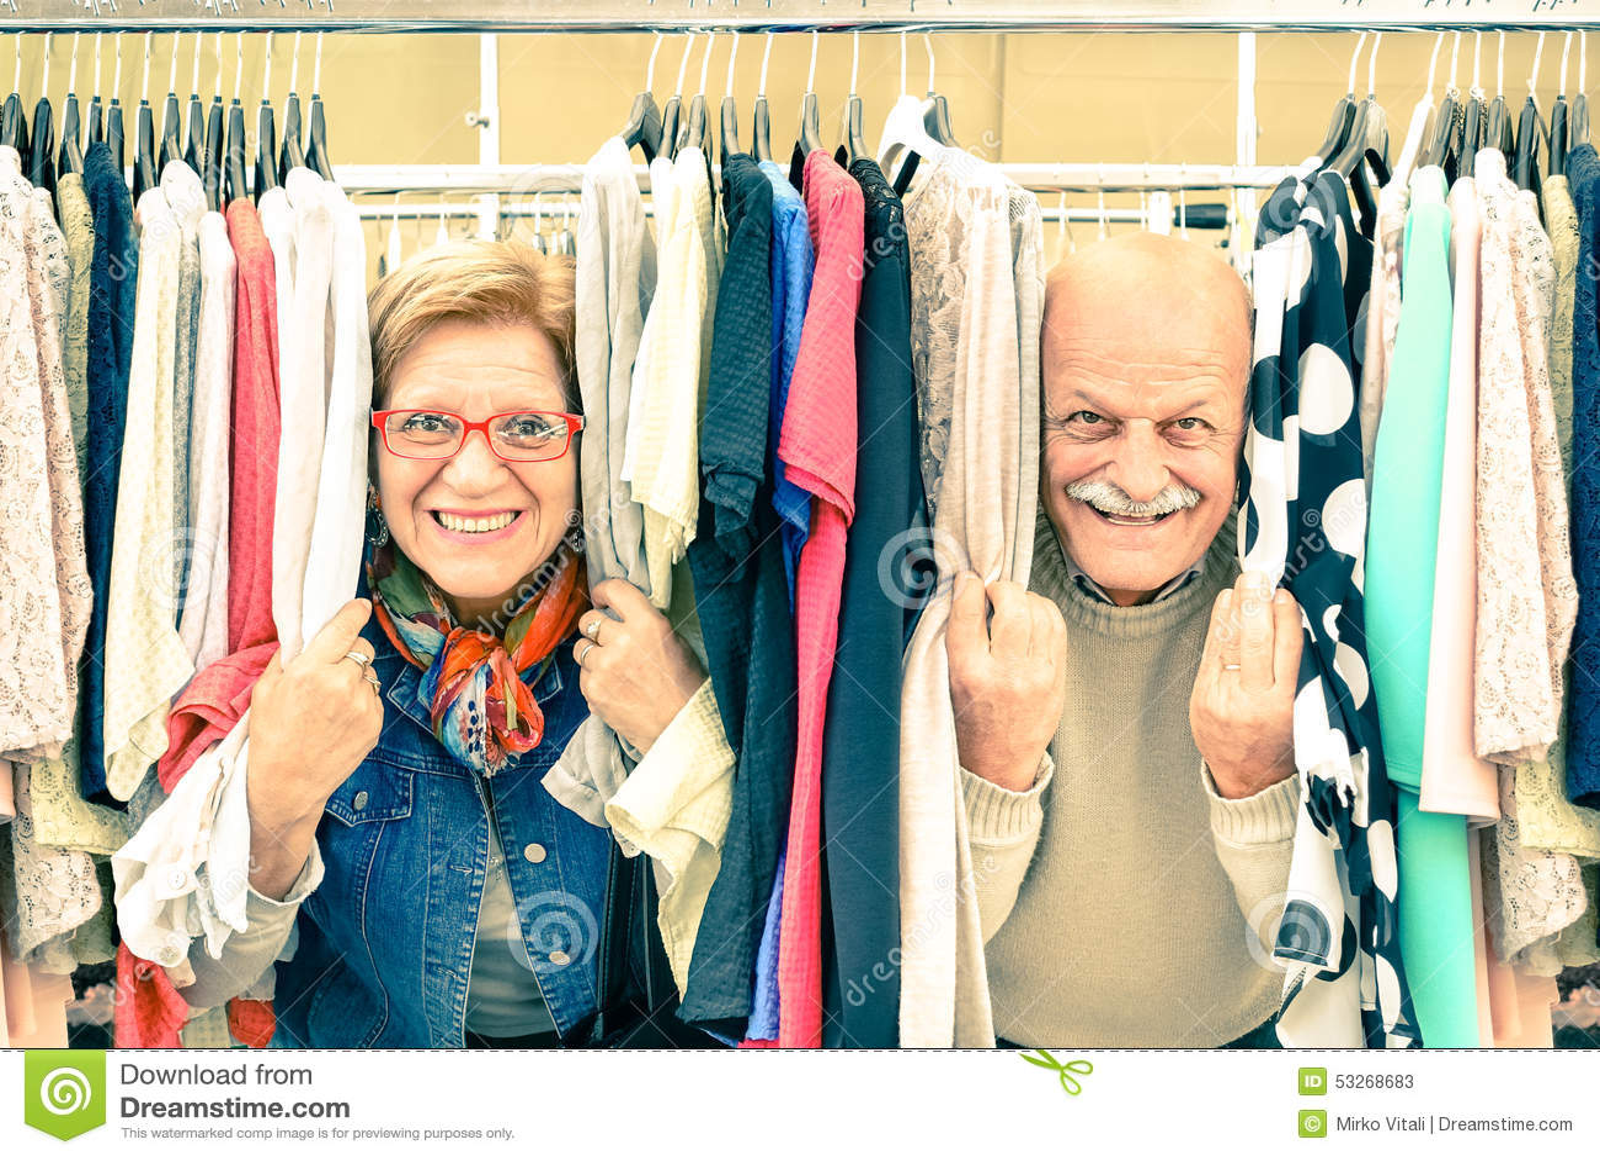 Playful senior couple at weakly flea market